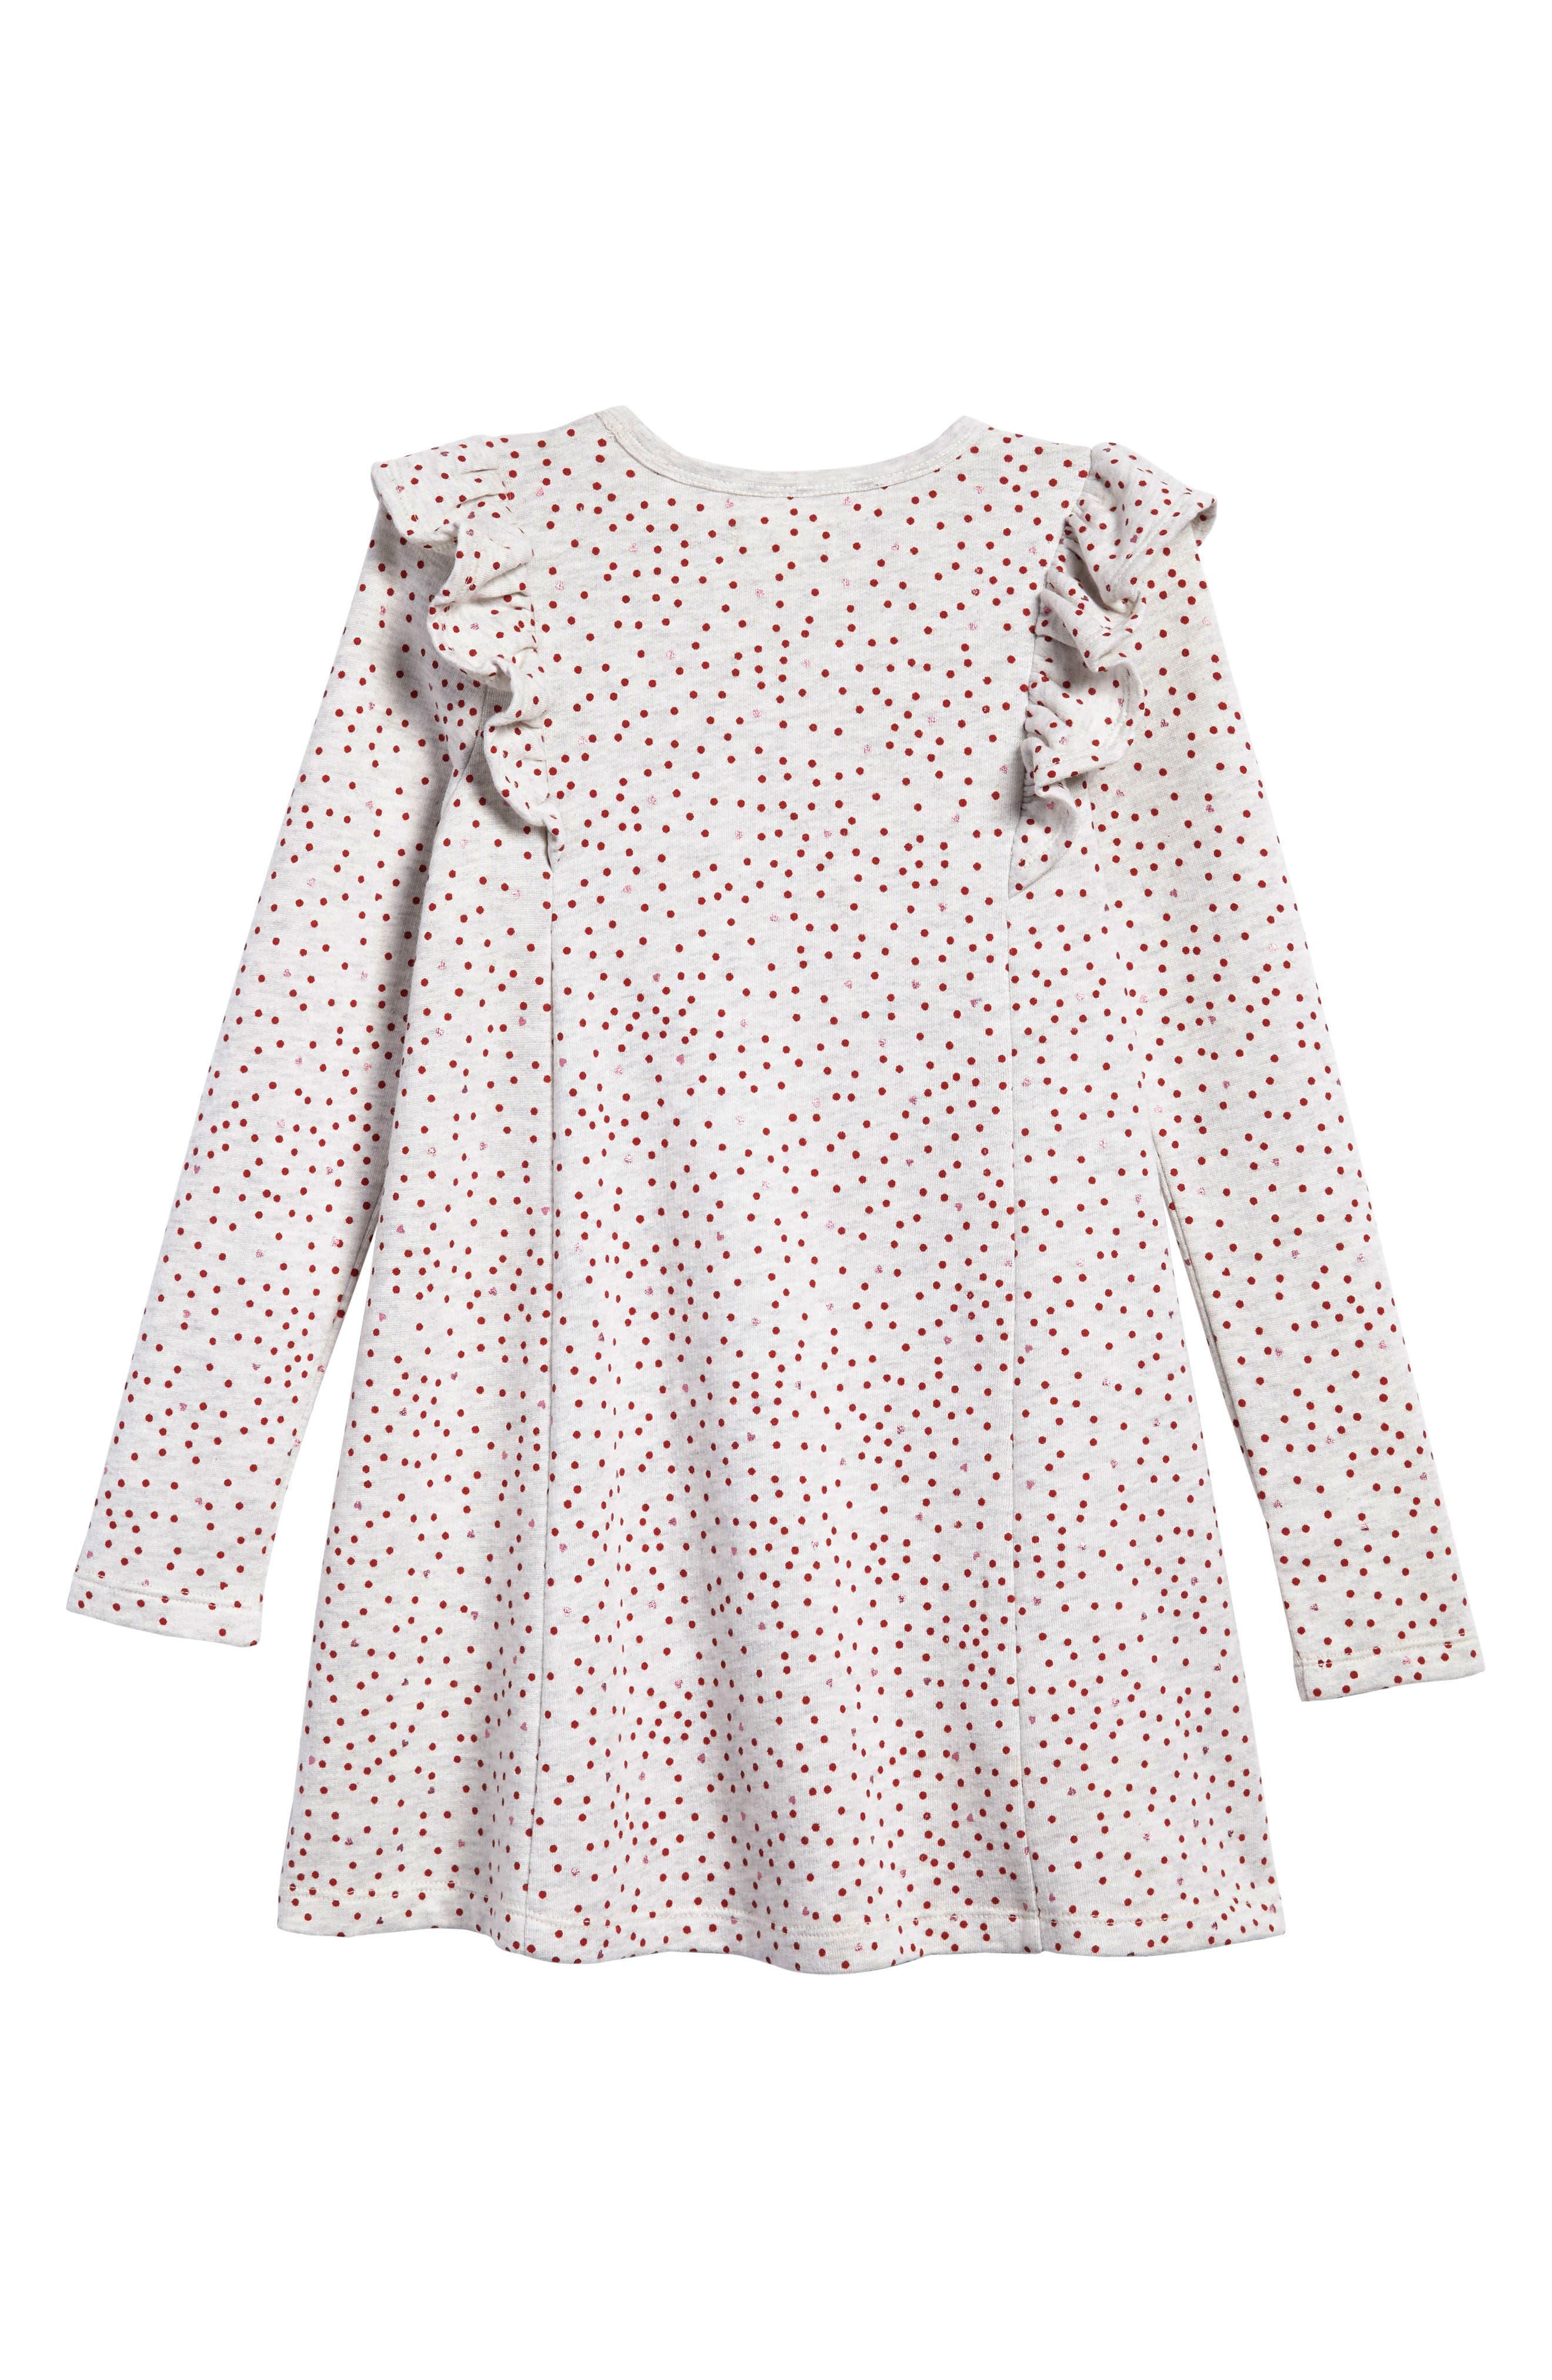 Ruffle Fleece Sweater Dress,                         Main,                         color, Ivory Egret Heather Hearts